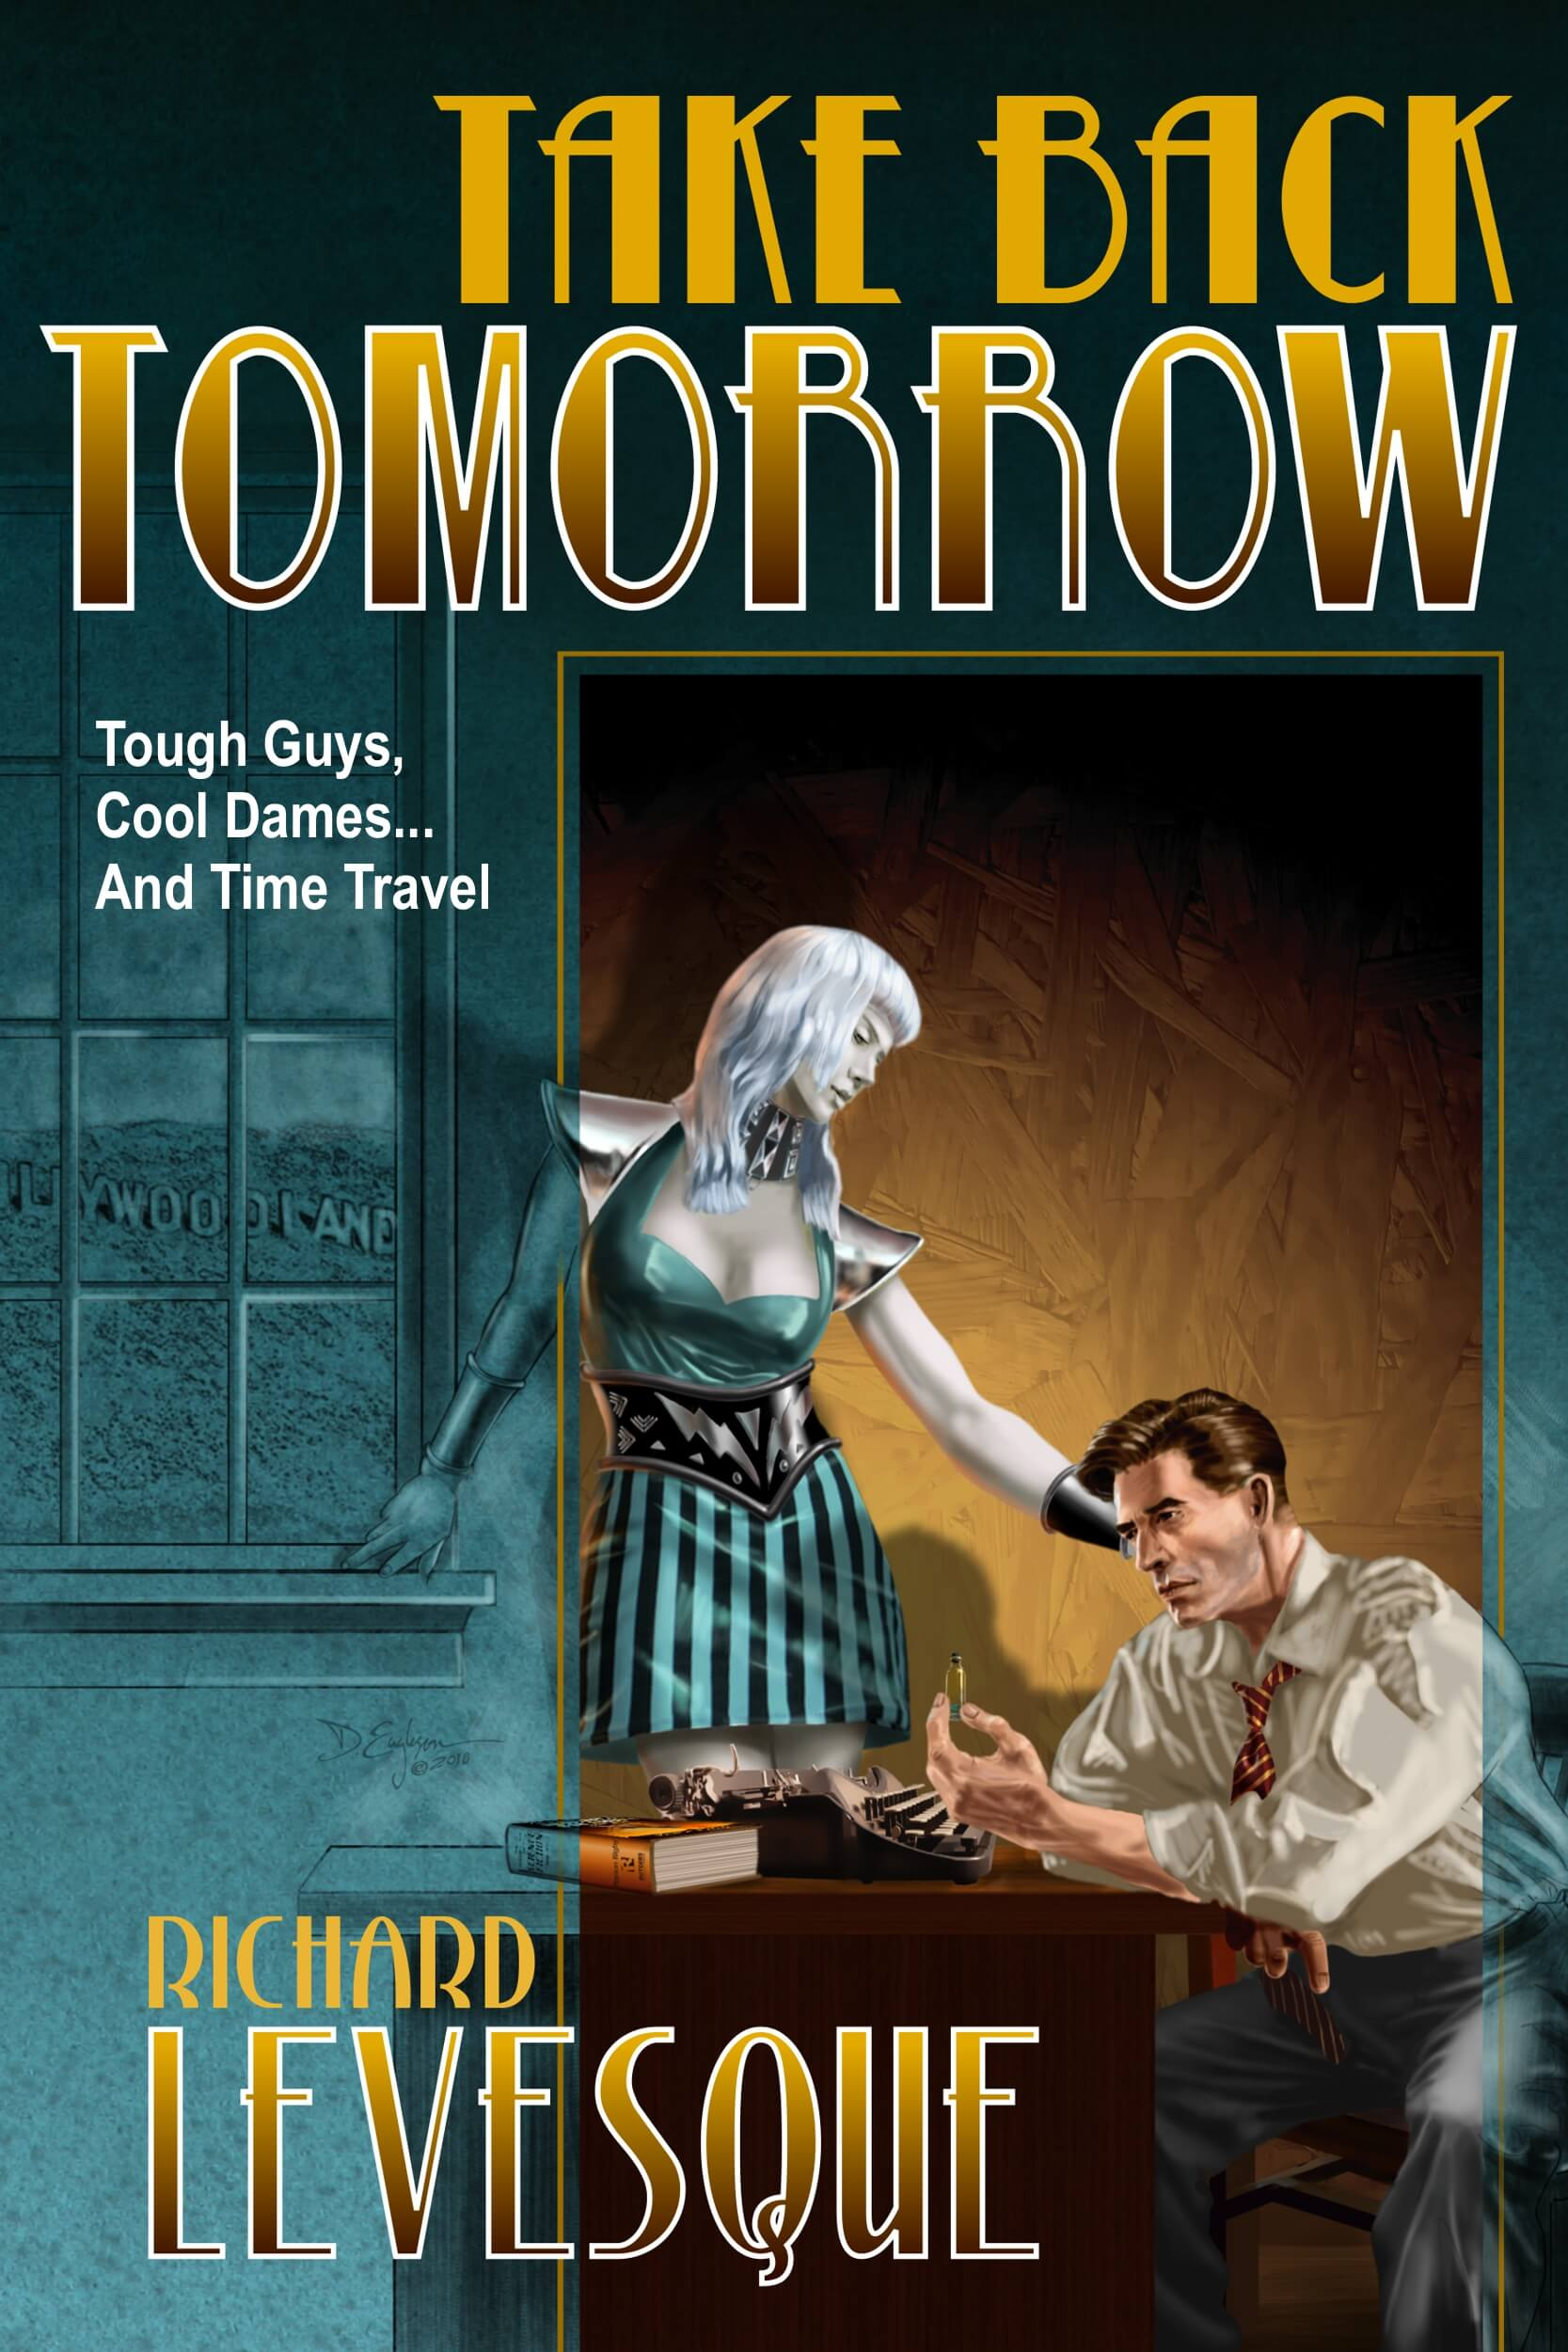 Levesque_Tomorrow_ebookcover